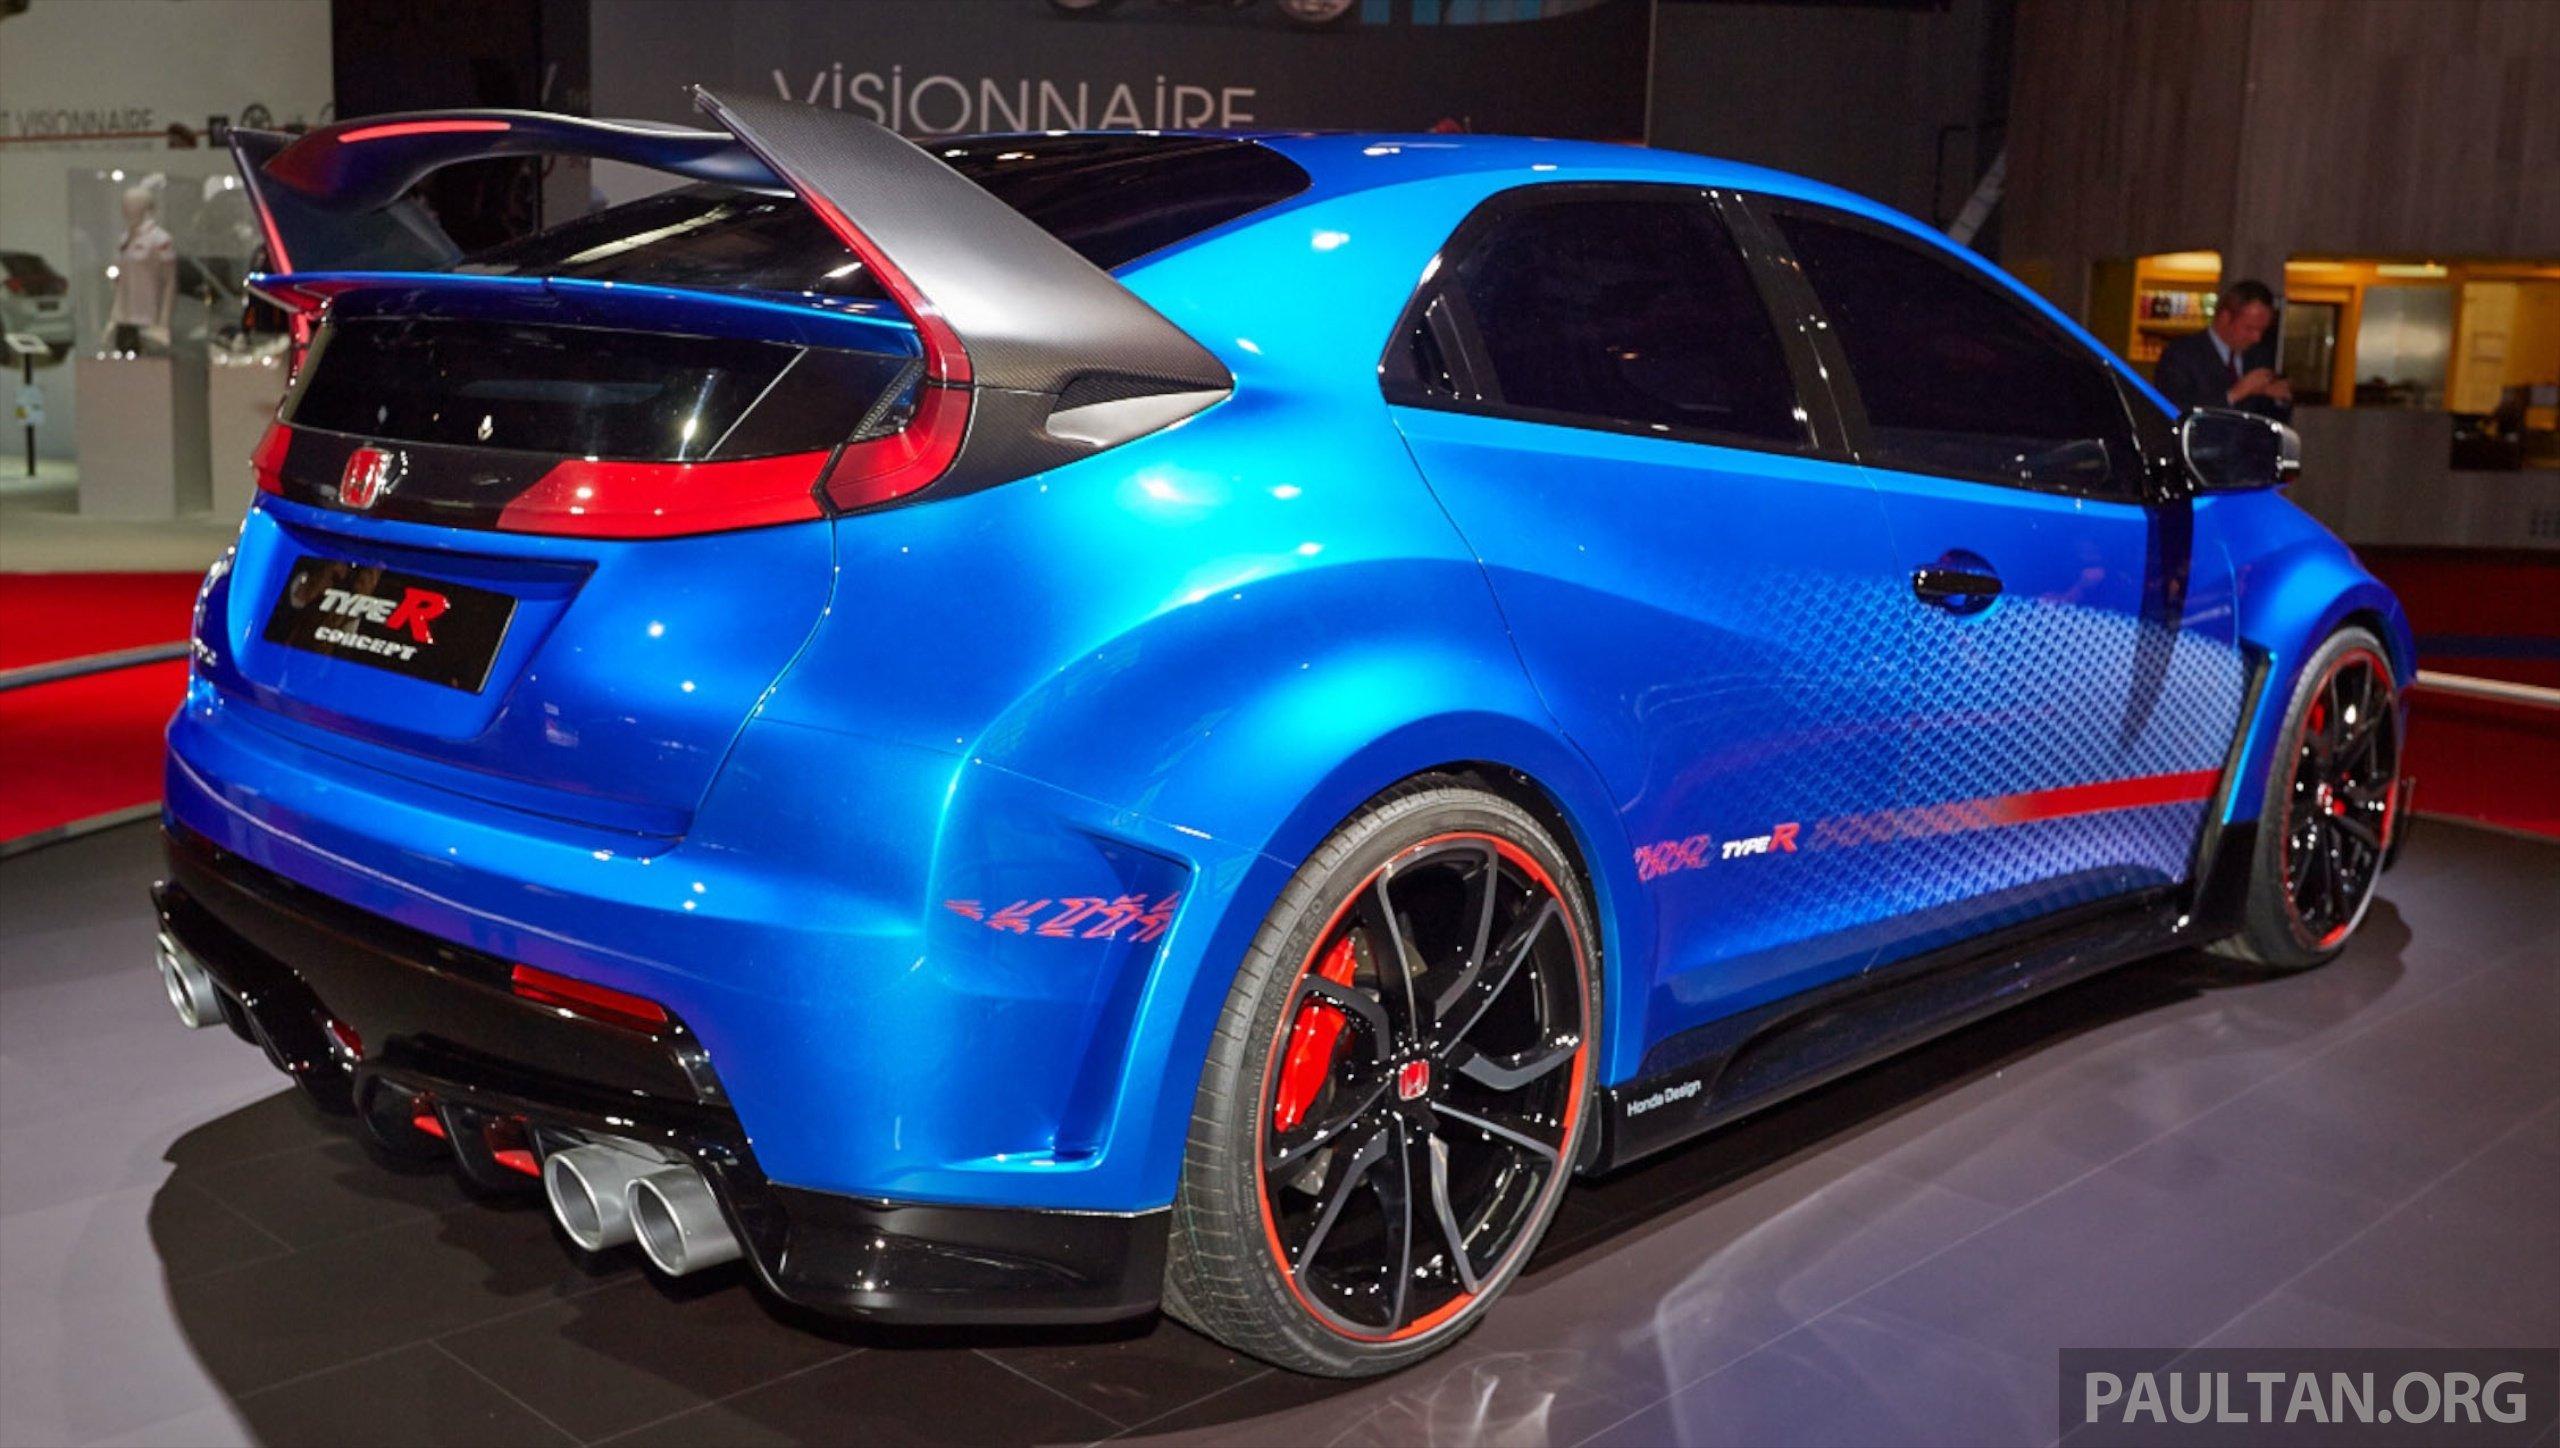 Honda Type R >> Honda Civic Type R Concept live on the Paris stand! Paul Tan - Image 277518